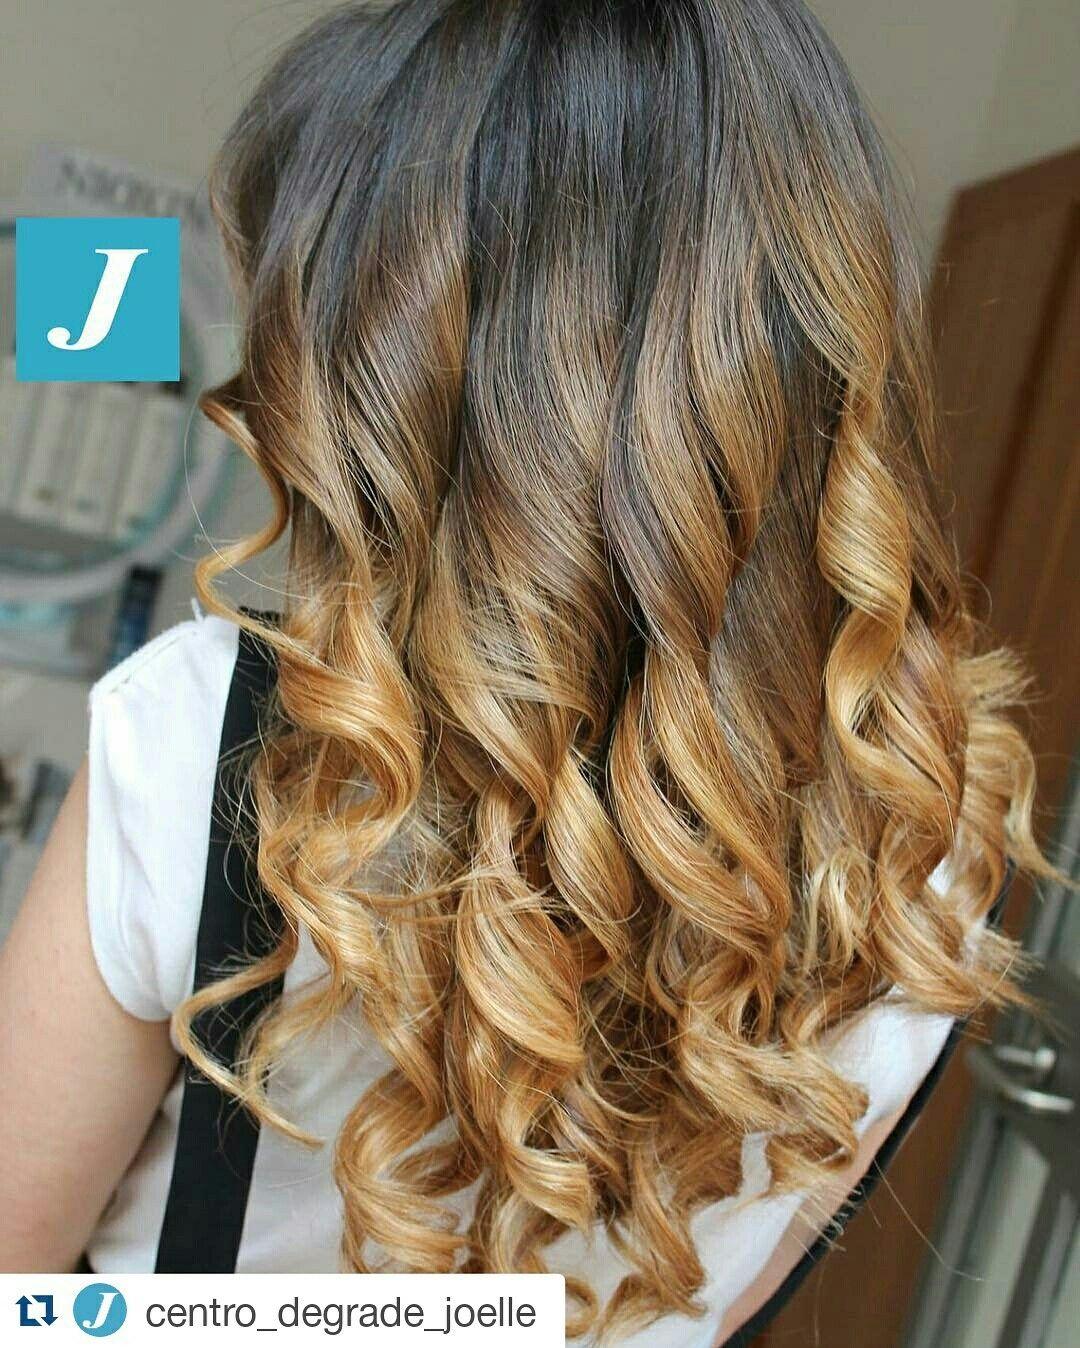 Che ci sia il sole o no, il Degradé Joelle illumina le tue giornate! #cdj #degradejoelle #tagliopuntearia #degradé #igers #musthave #hair #hairstyle #haircolour #longhair #ootd #hairfashion #madeinitaly #wellastudionyc